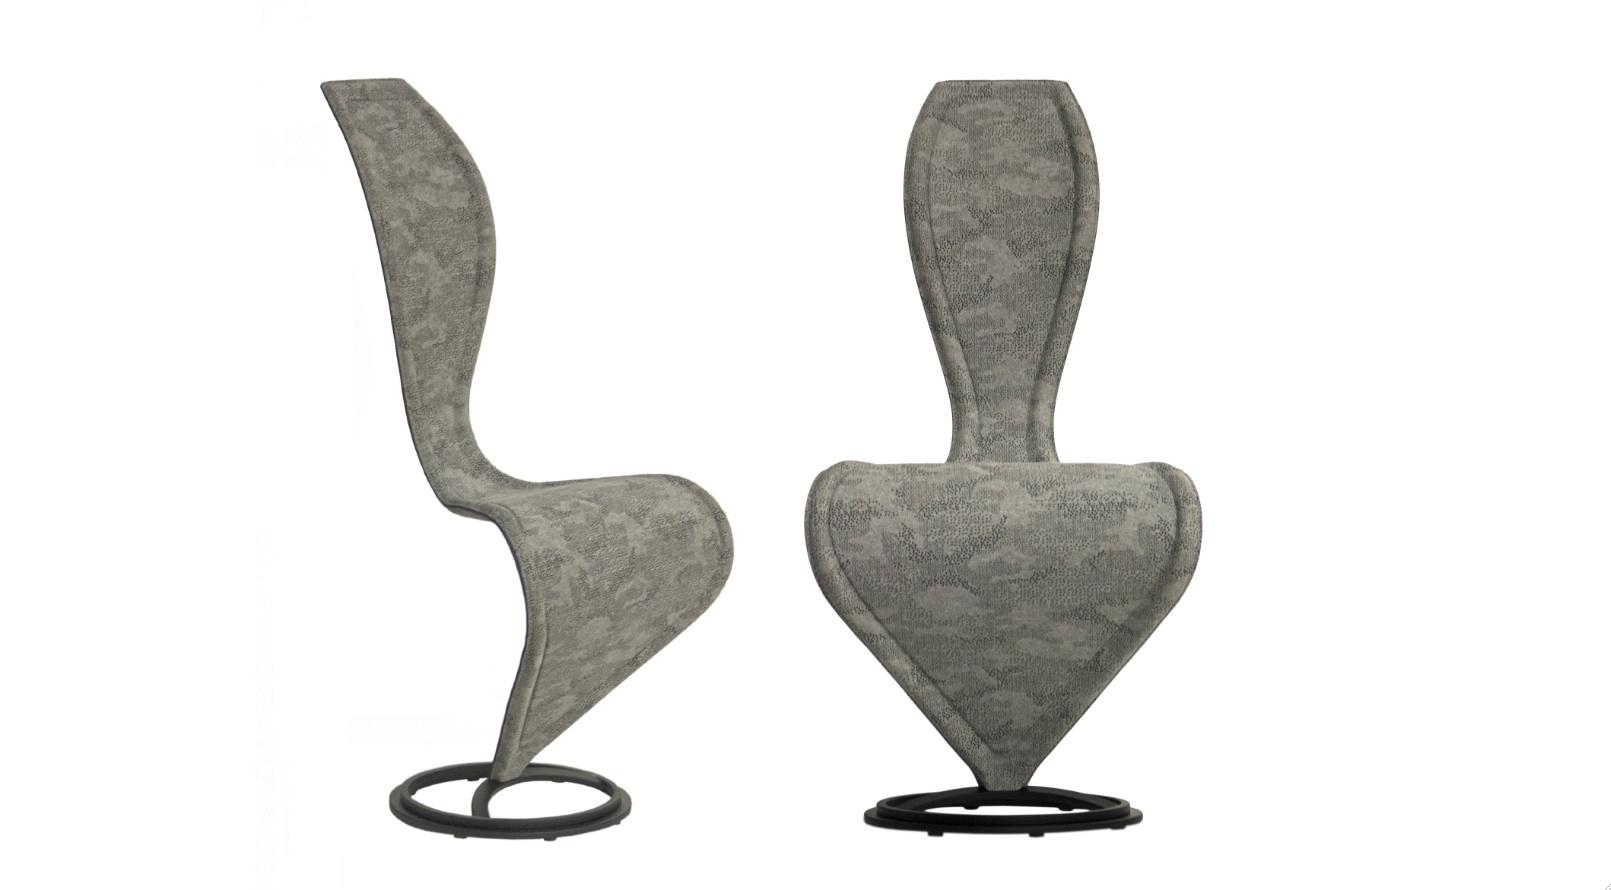 Cappellini-SChair-SChair Homage to Berlin Alcantara camouflage limited edition